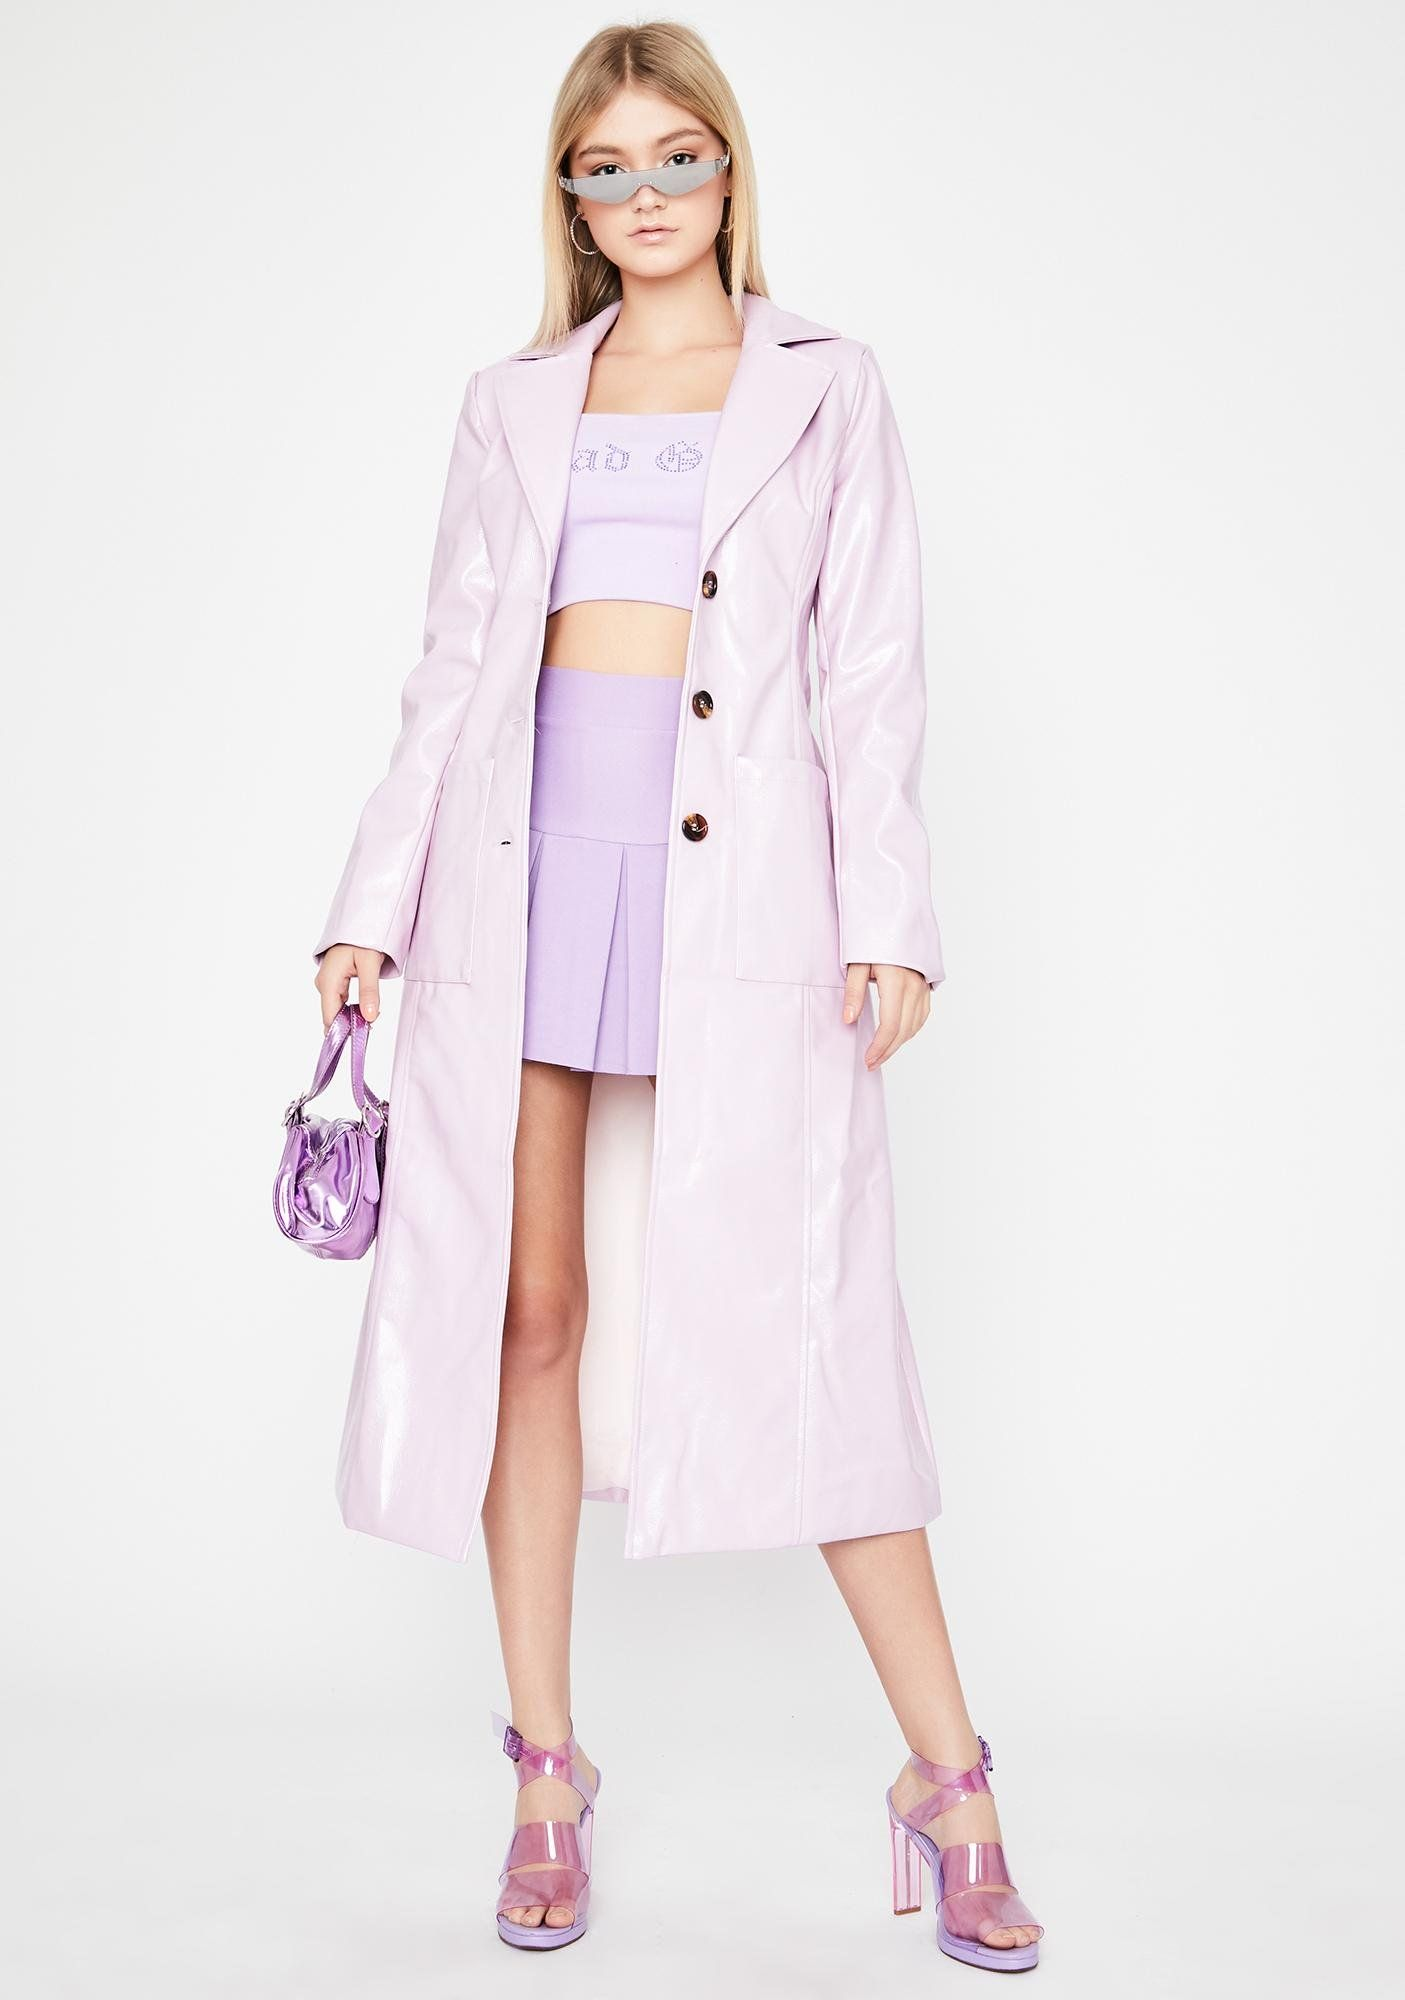 Lavender Vinyl Long Belted Button Up Trench Coat Dolls